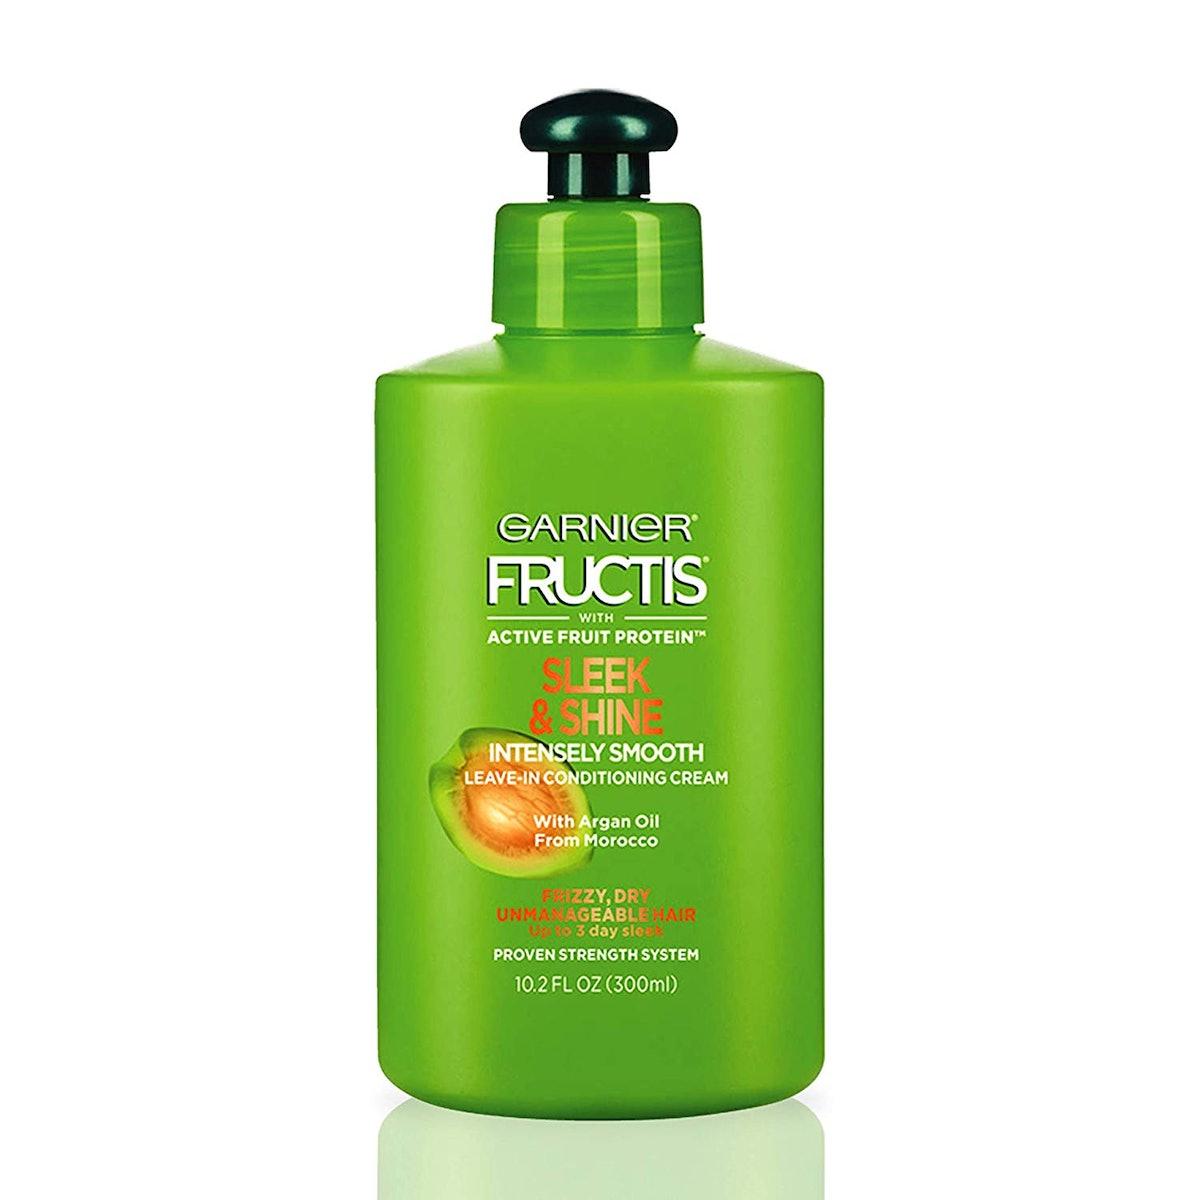 Garnier Fructis Sleek & Shine Intensely Smooth Leave-In Conditioner